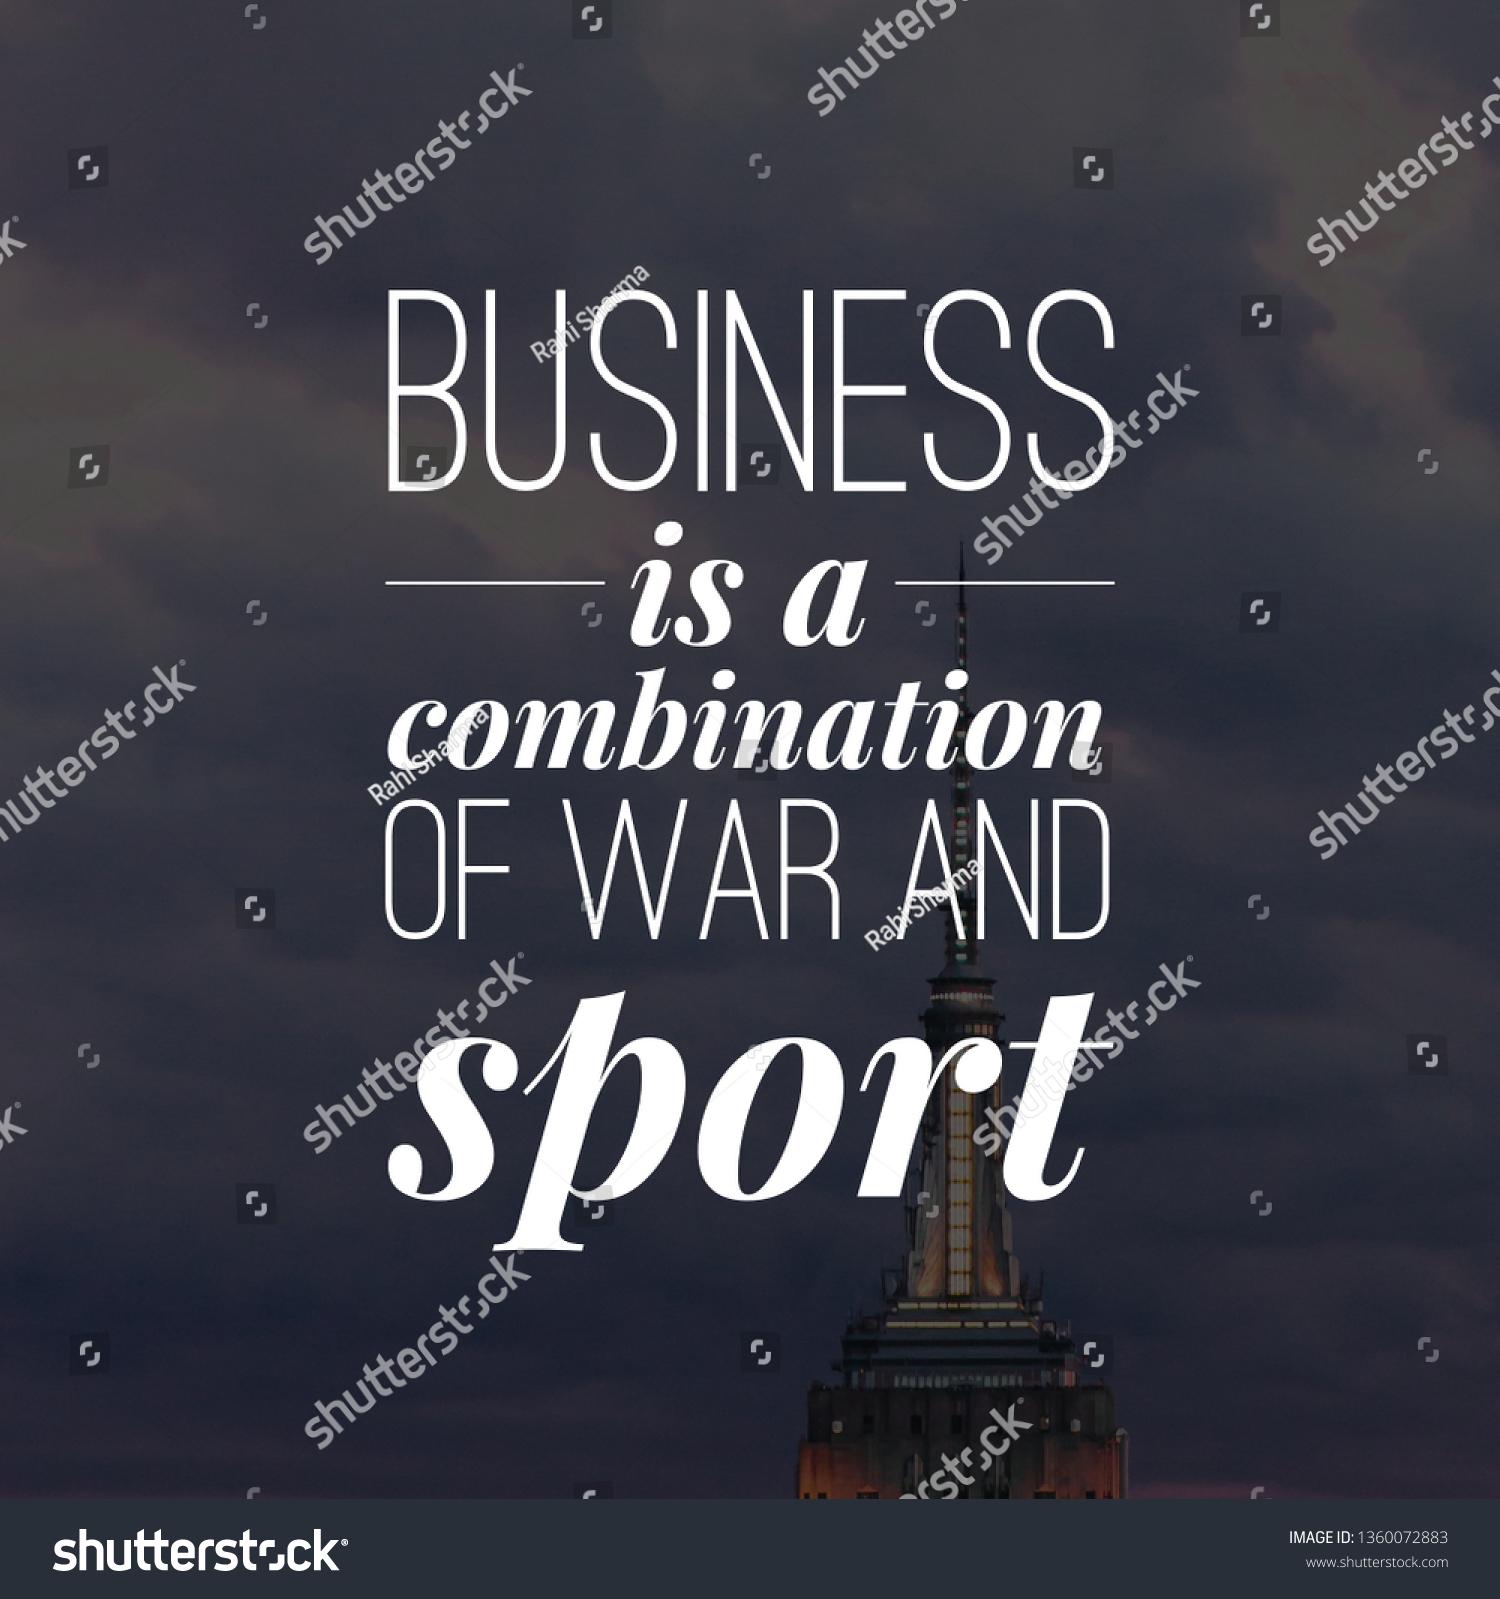 Business Quotes Entrepreneur Quotes Motivational Quotes